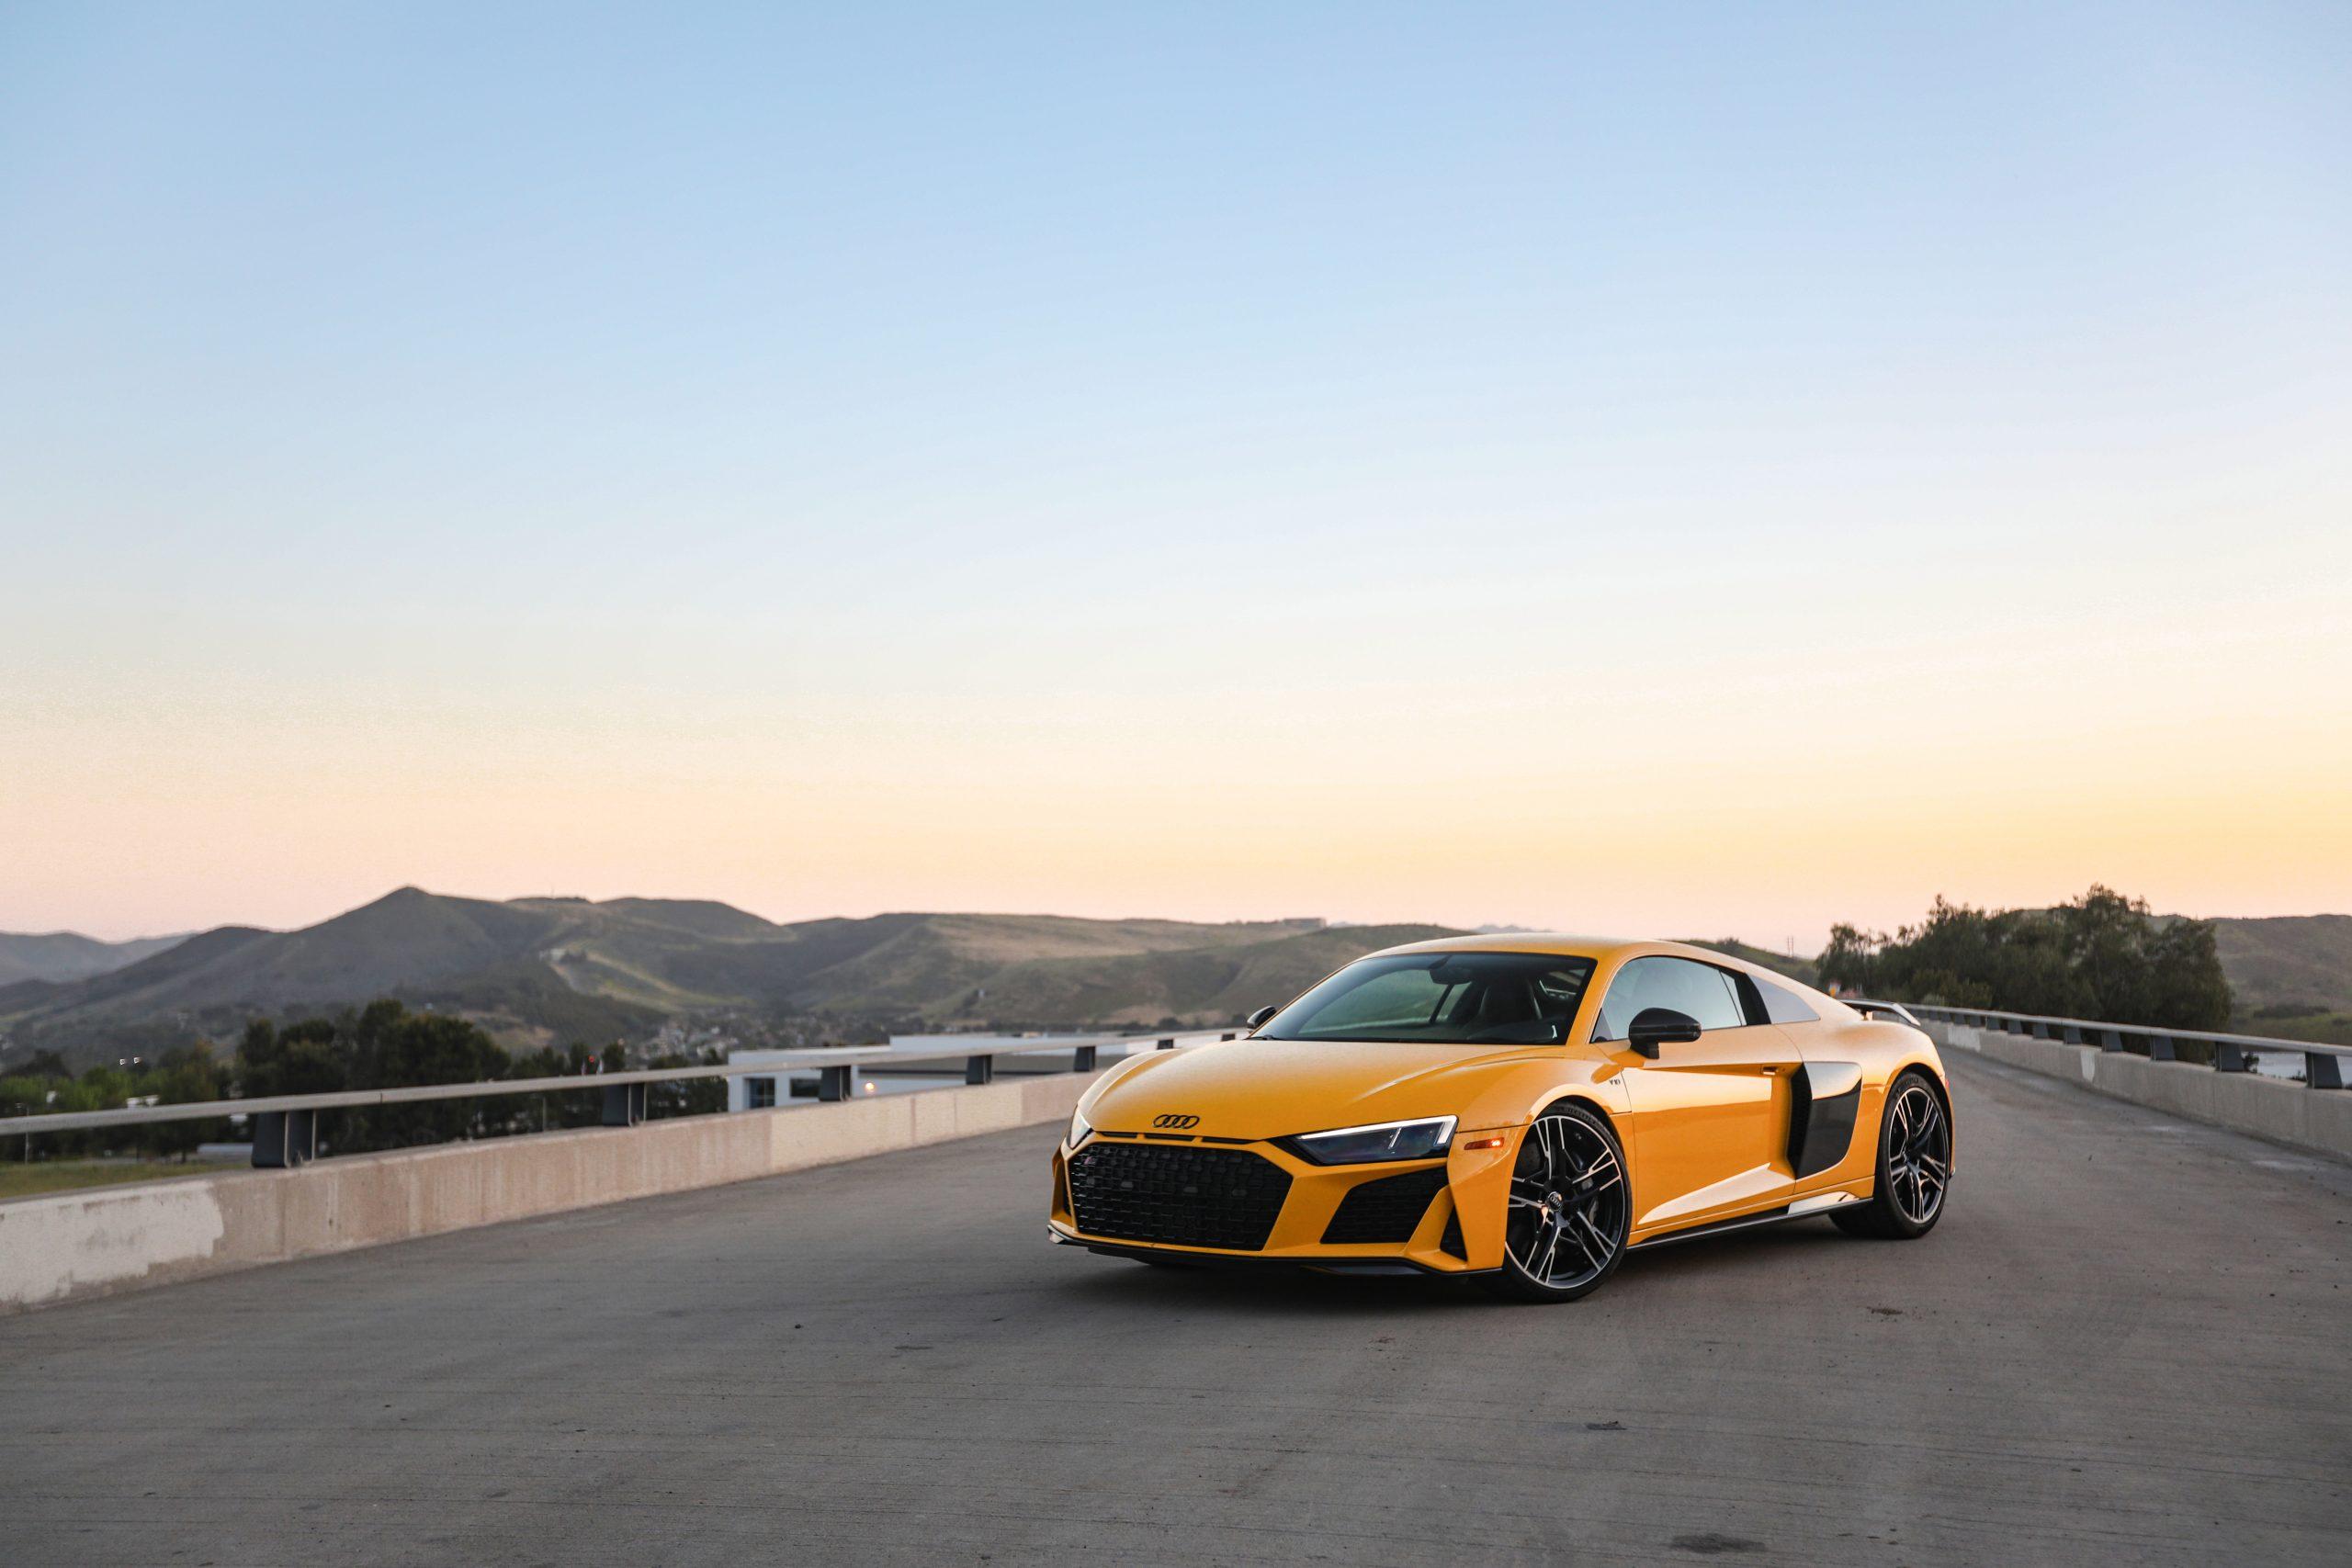 2020 Audi R8 front wide